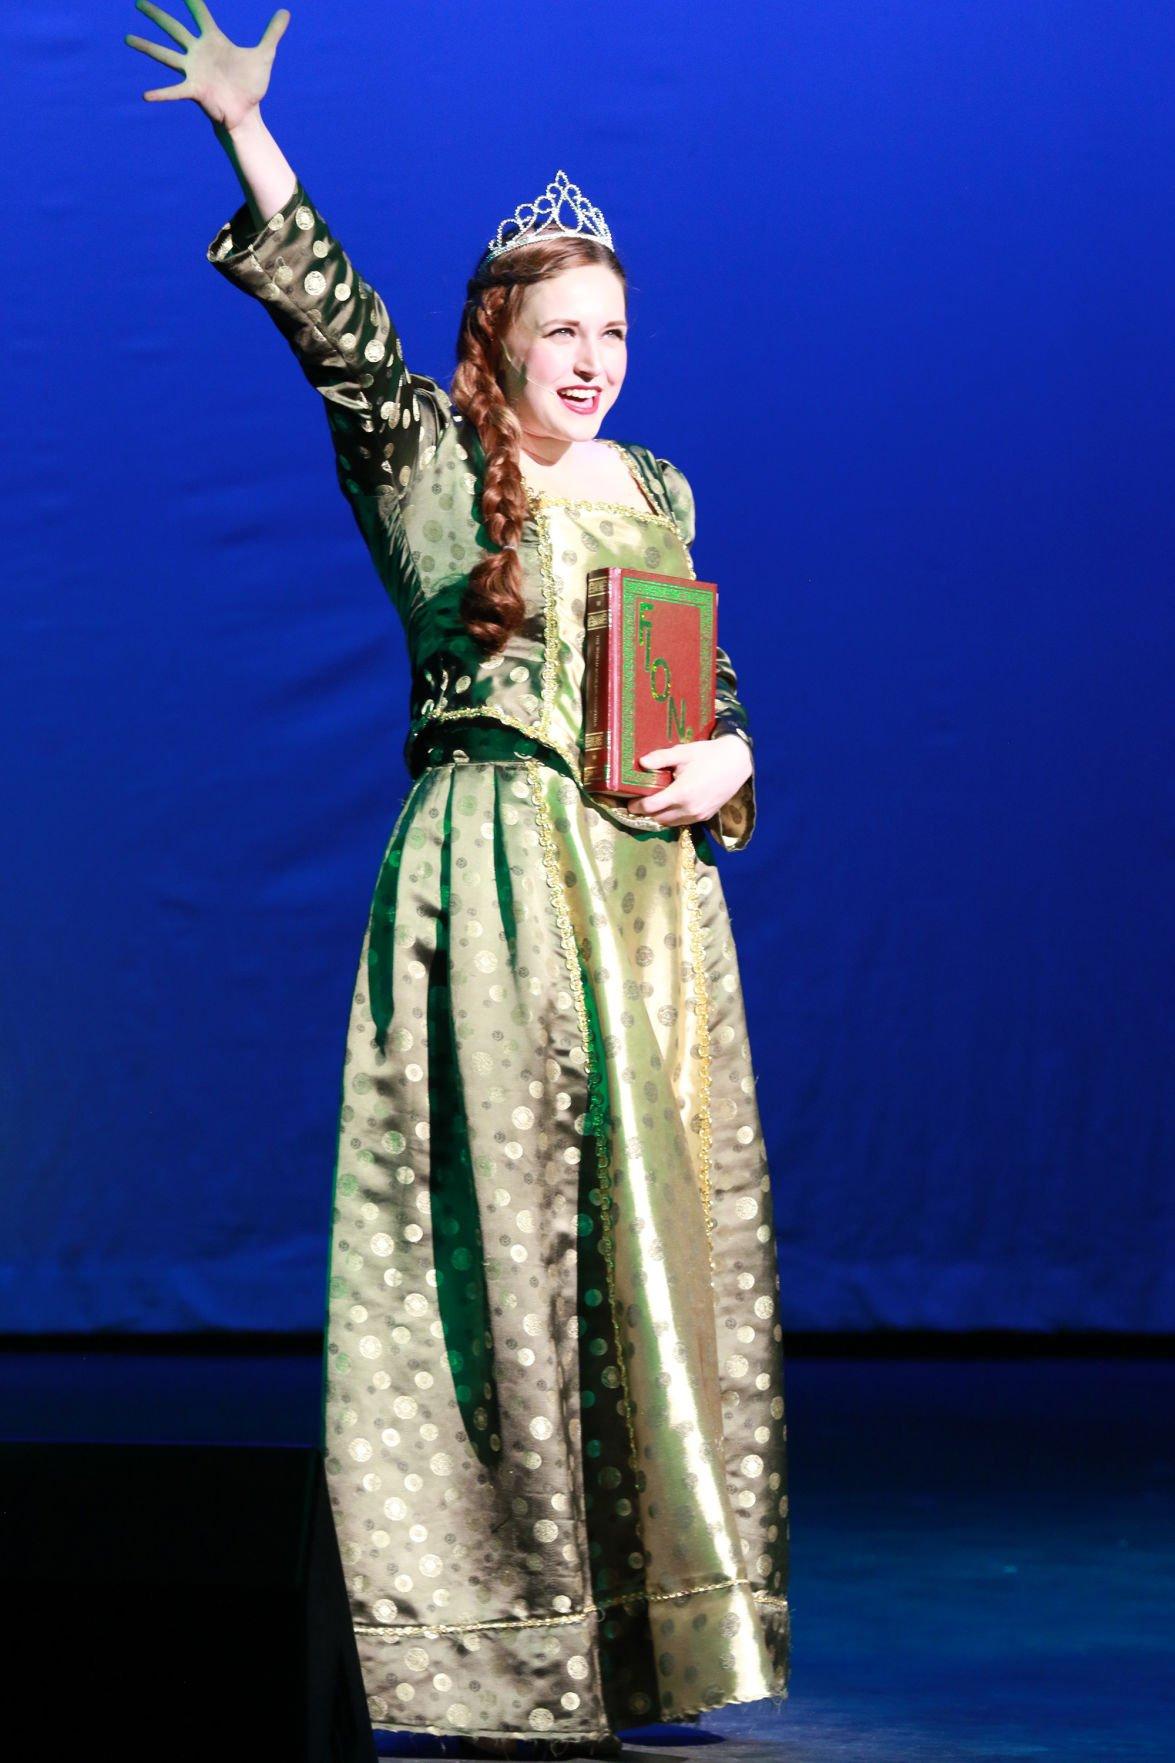 PHOTOS: Theatre West's Shrek, The Musical 2019